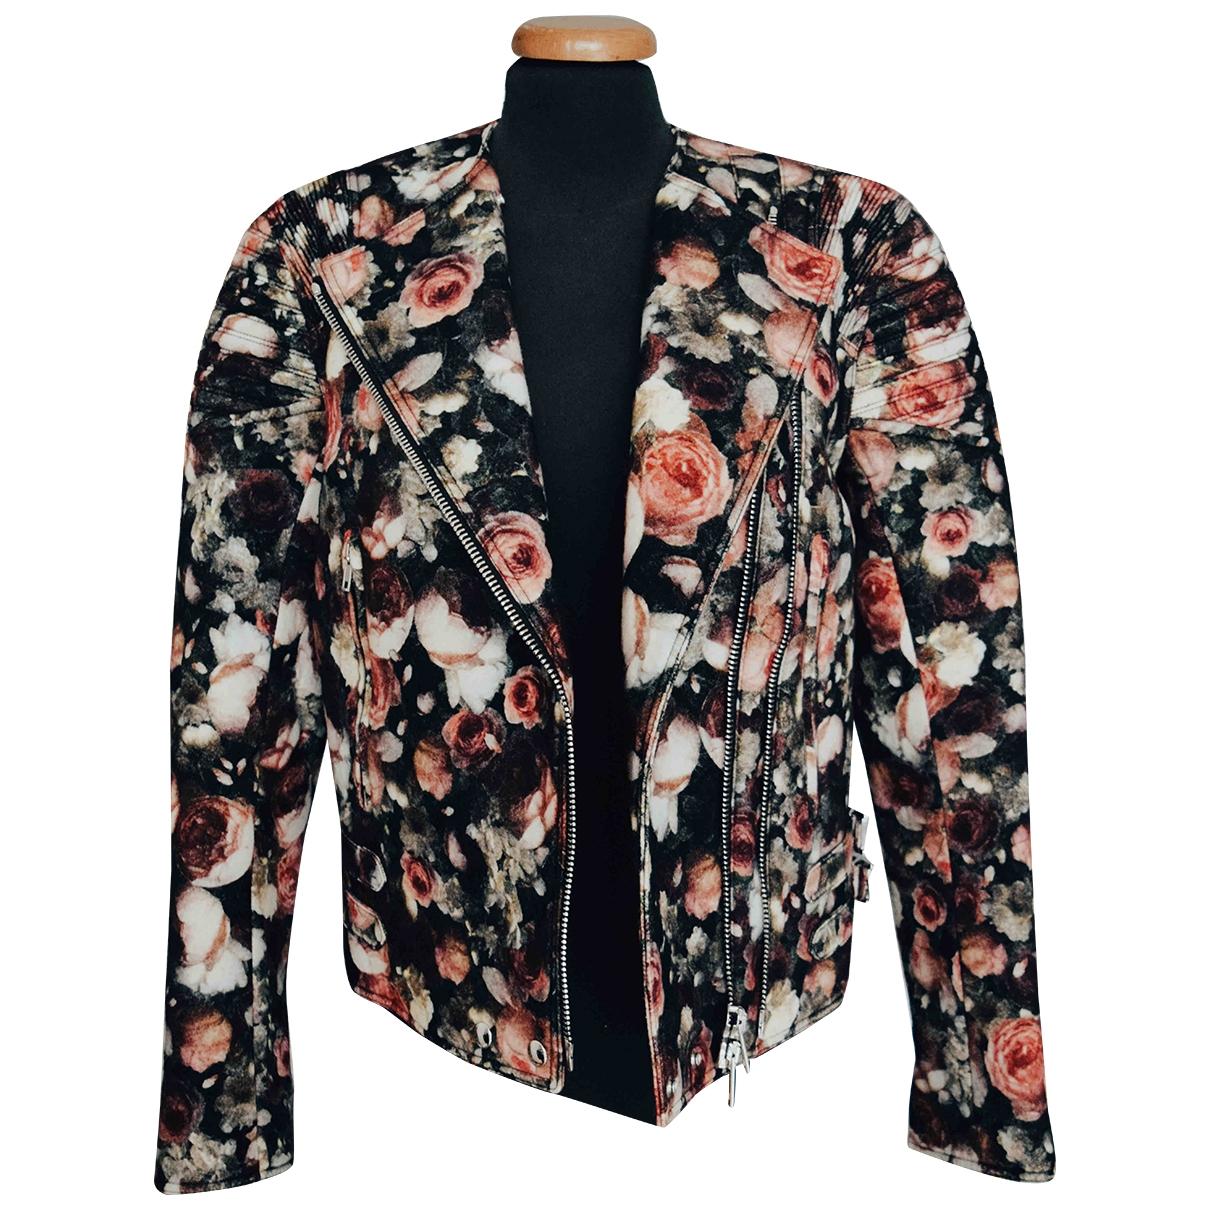 Givenchy \N Lederjacke in  Bunt Wolle